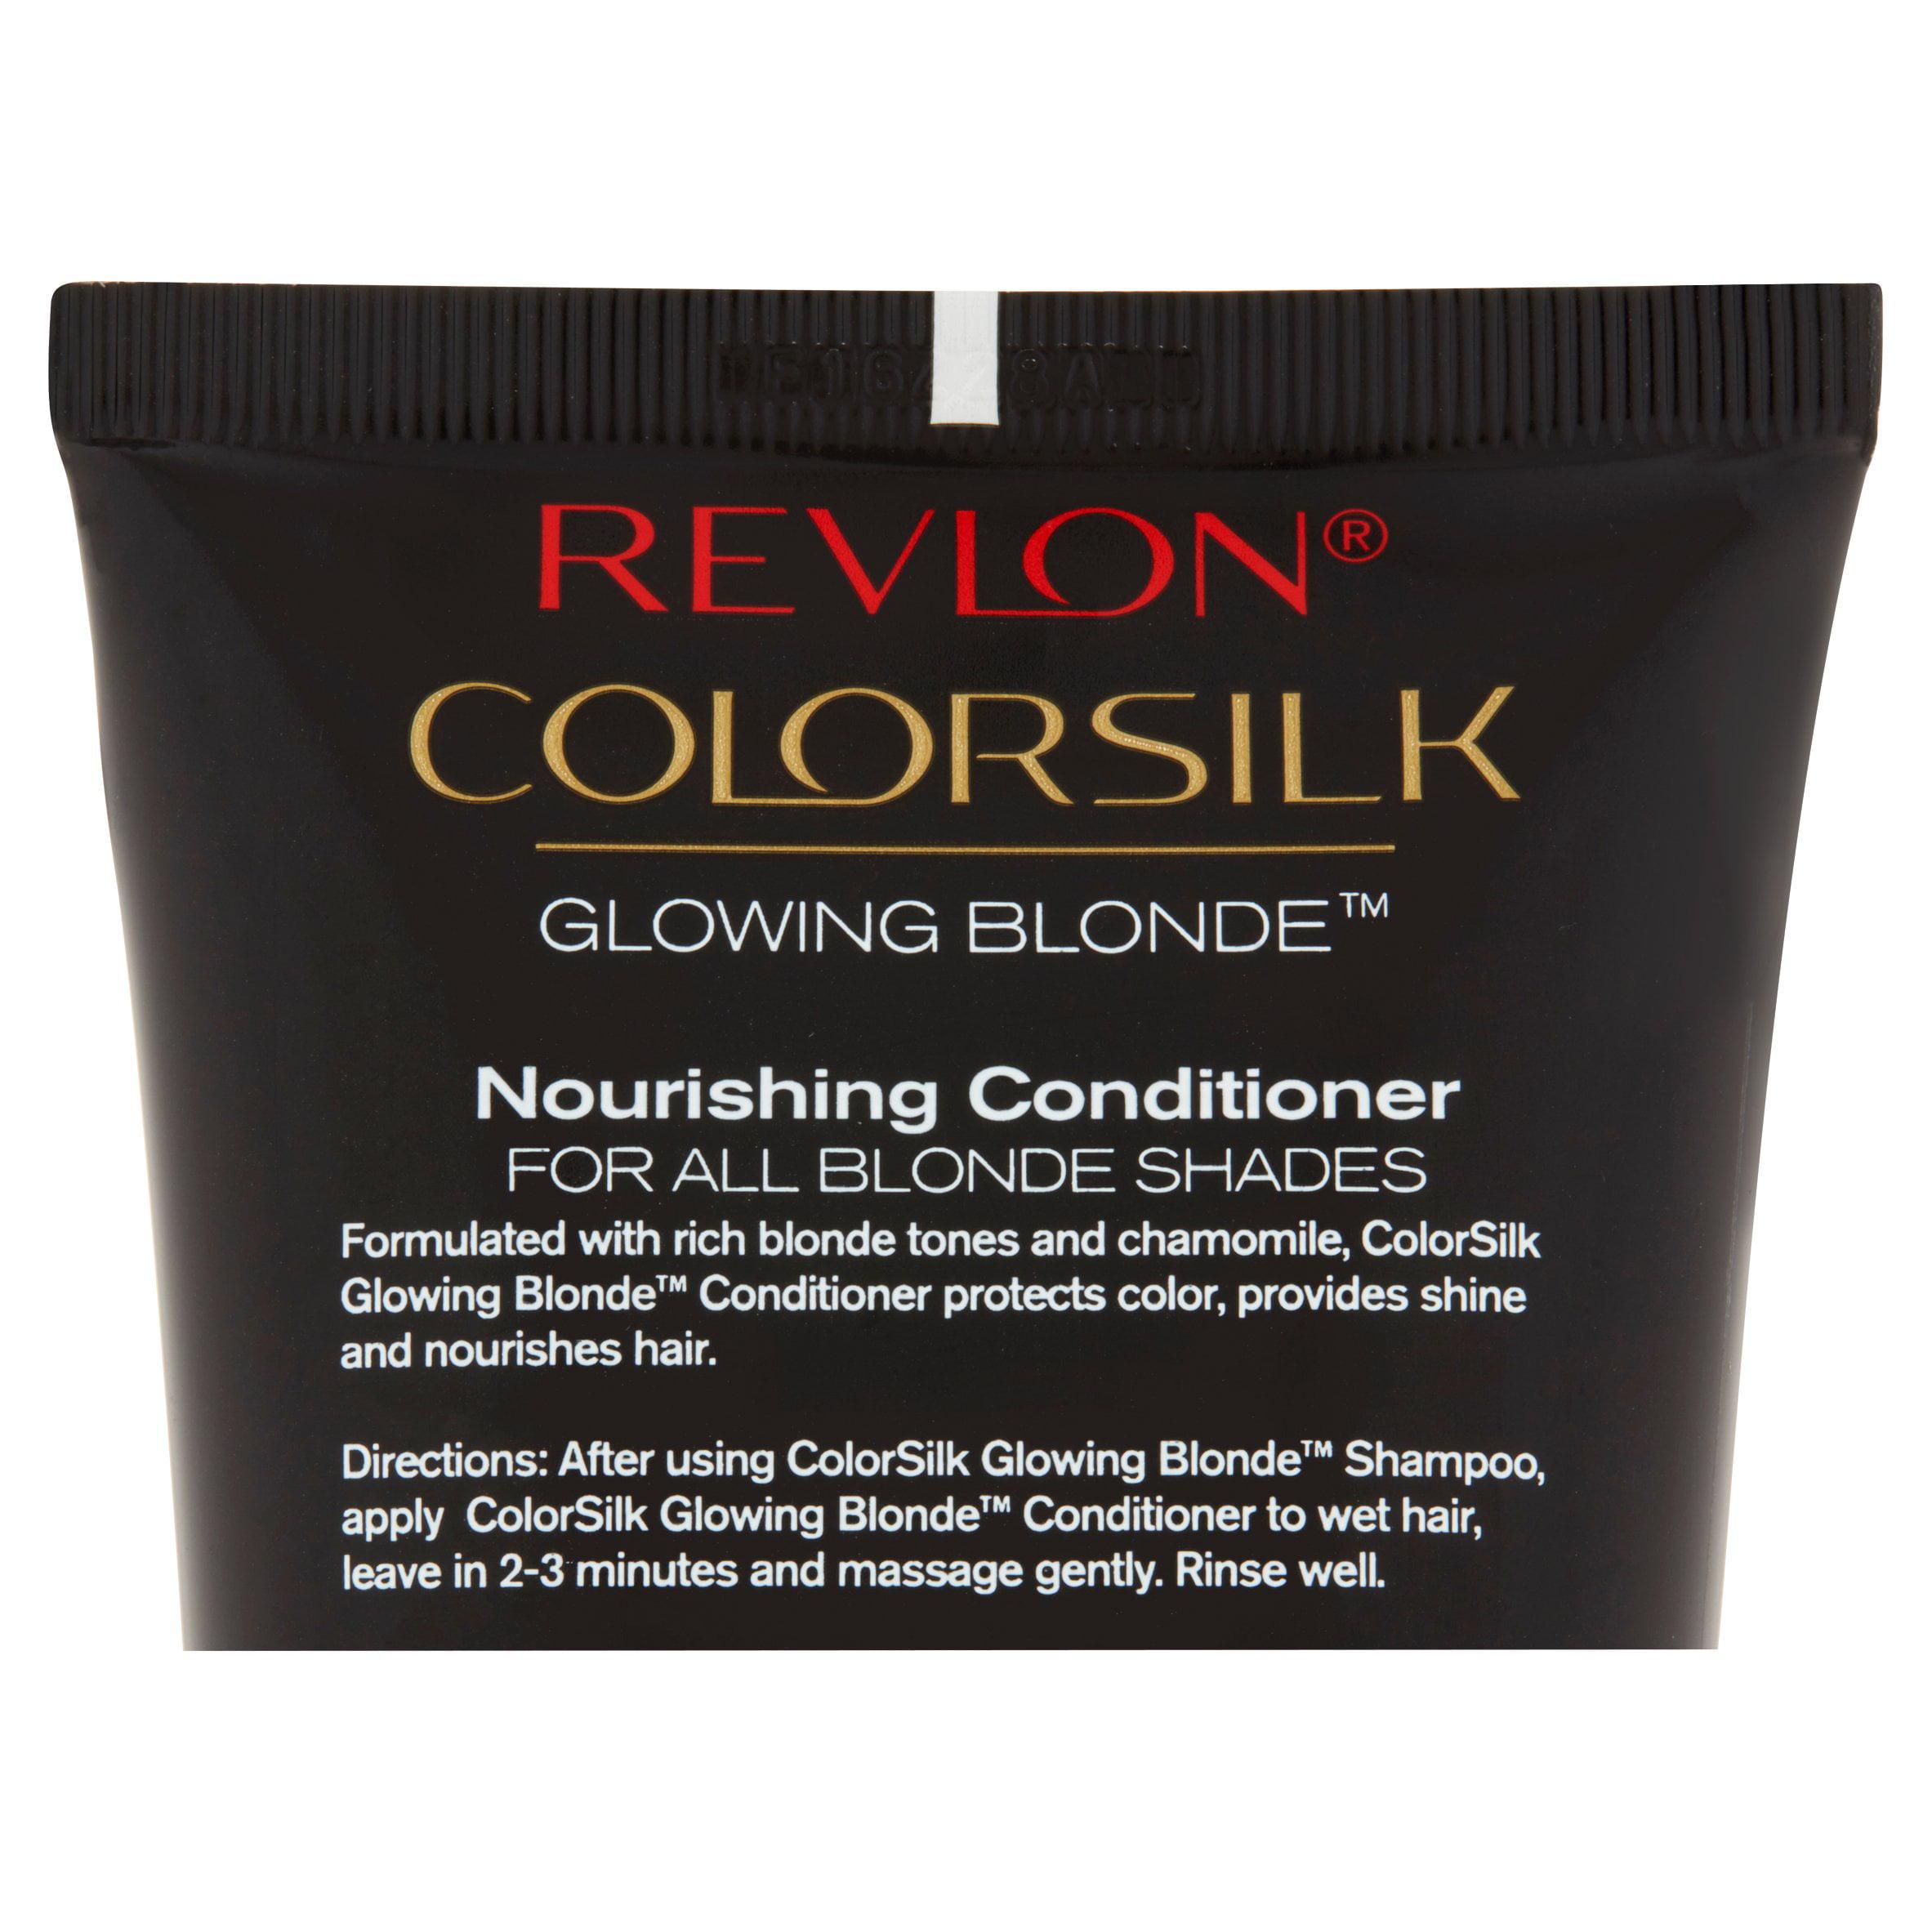 Revlon Colorsilk Bold Black 2 Colorstay Nourishing Conditioner 8 45